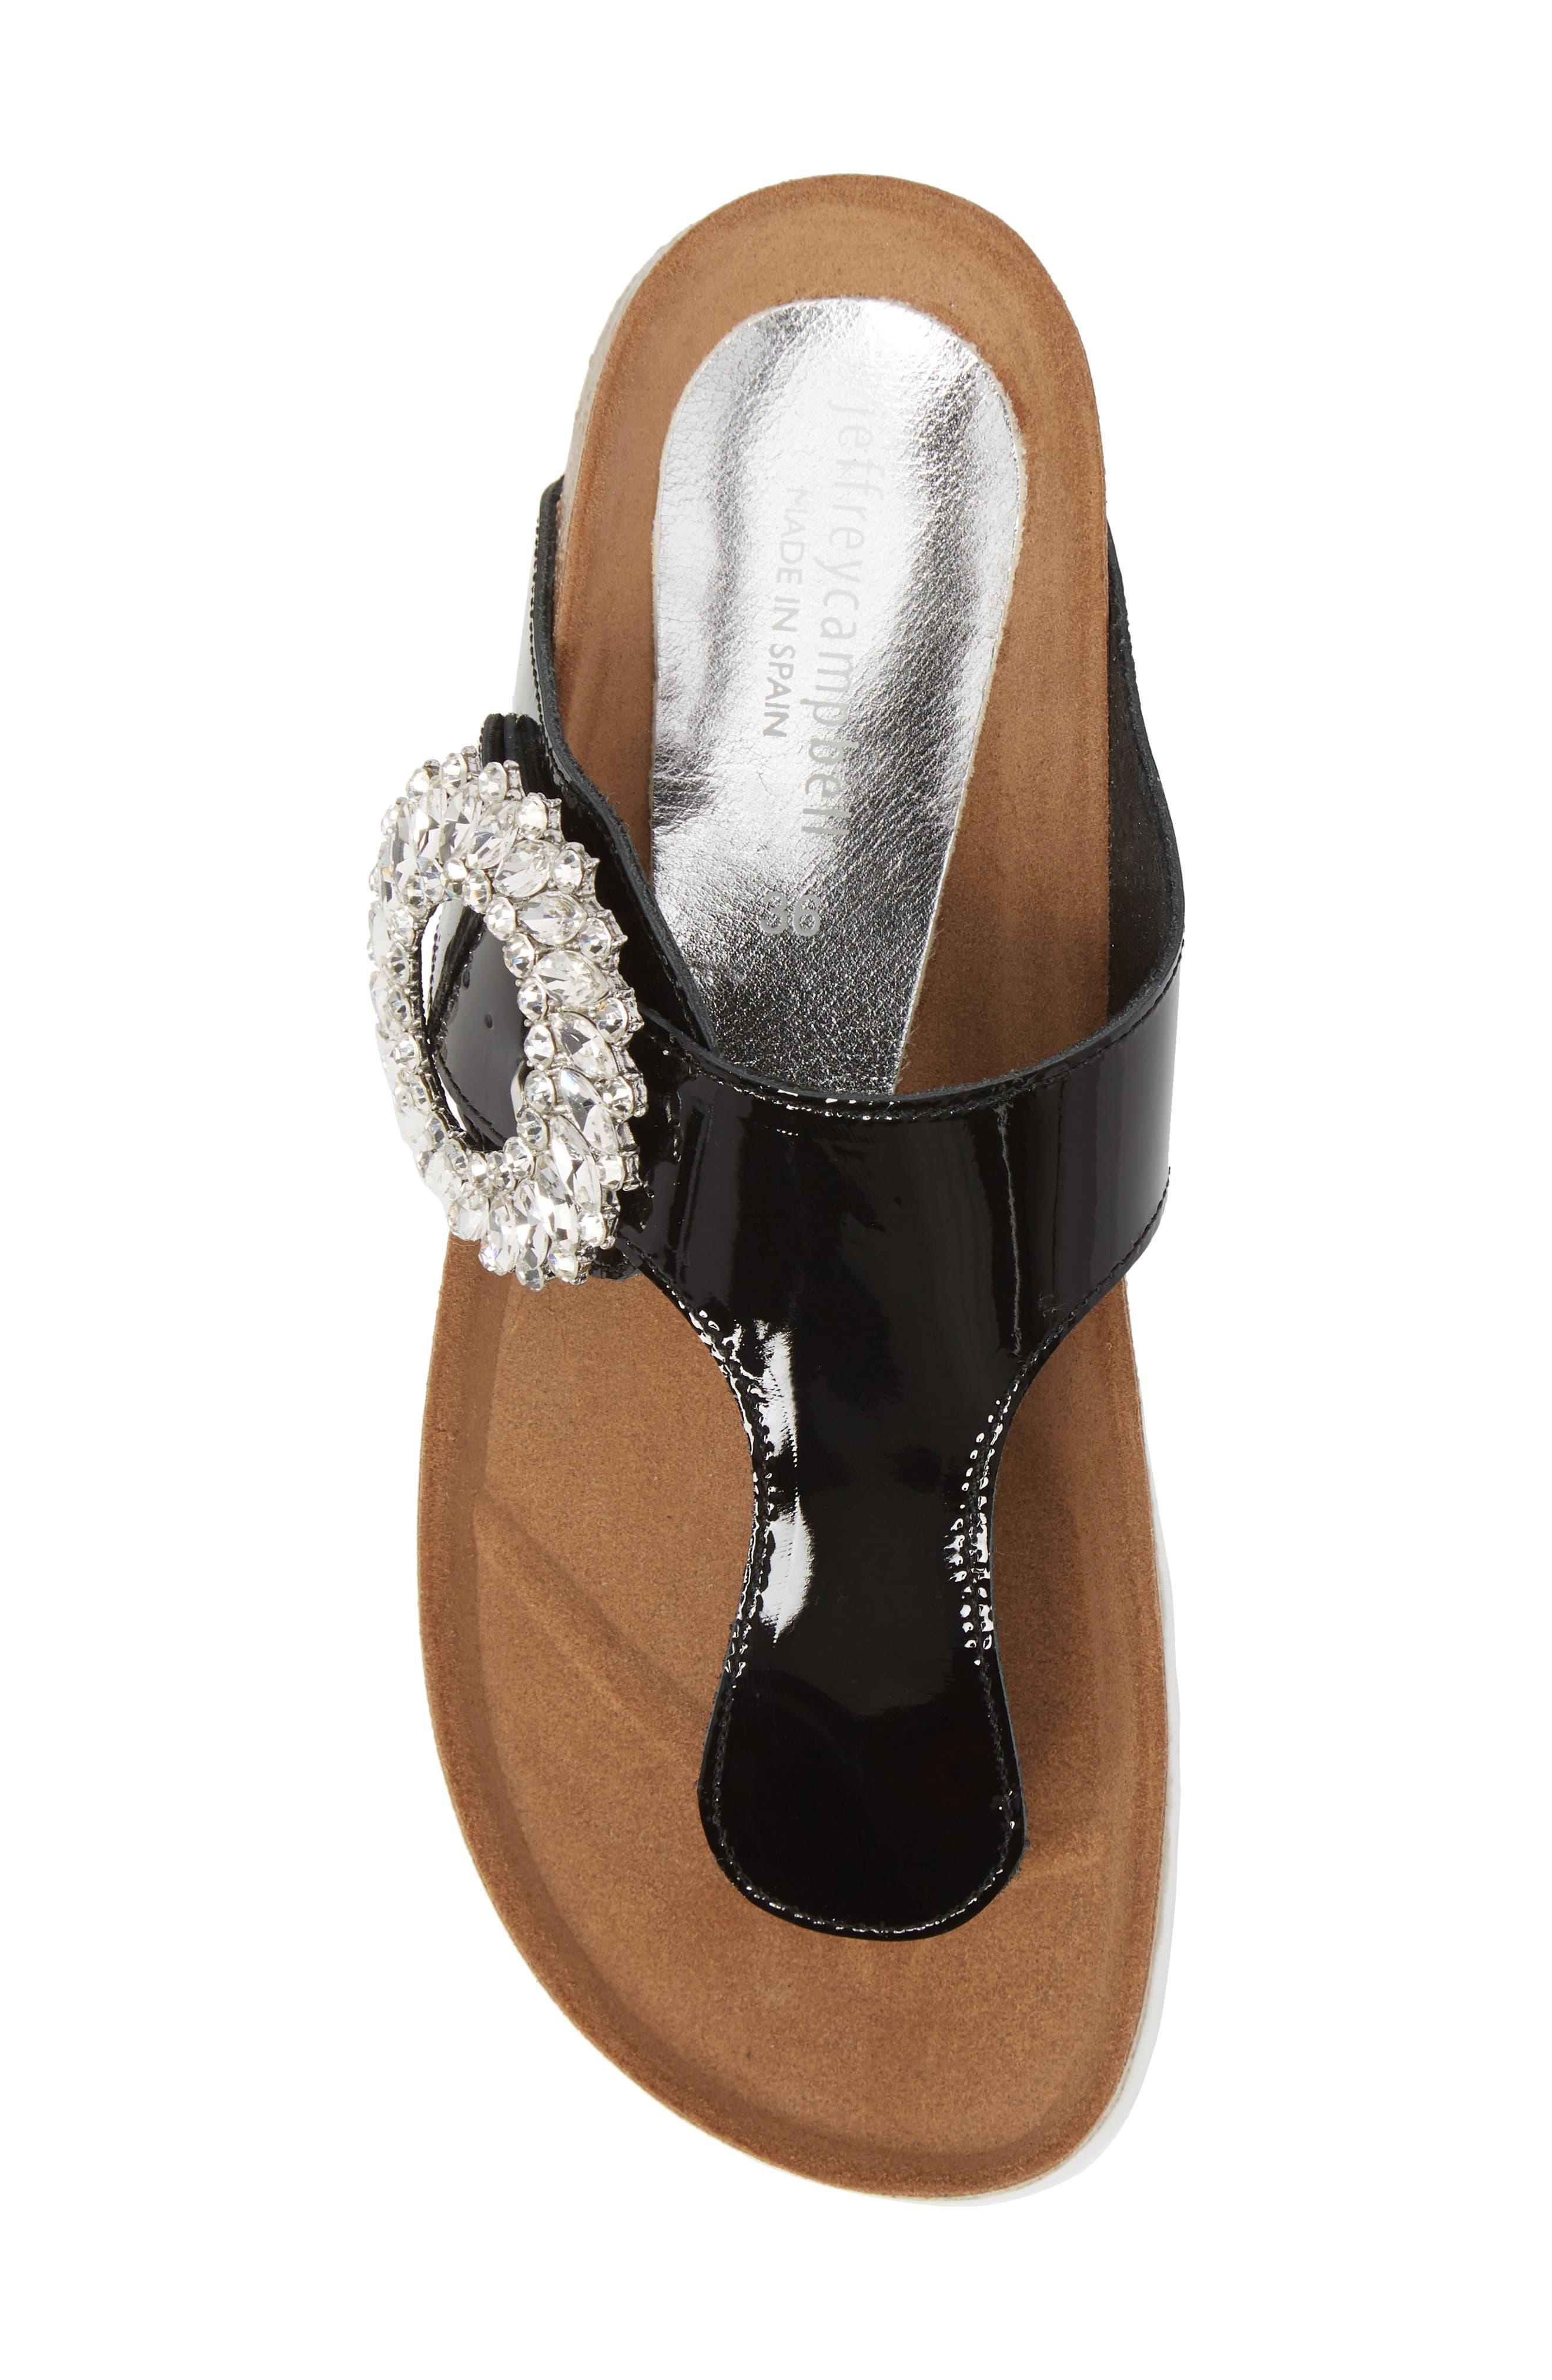 Madeira Embellished T-Strap Sandal,                             Alternate thumbnail 5, color,                             Black Patent/ Black Silver